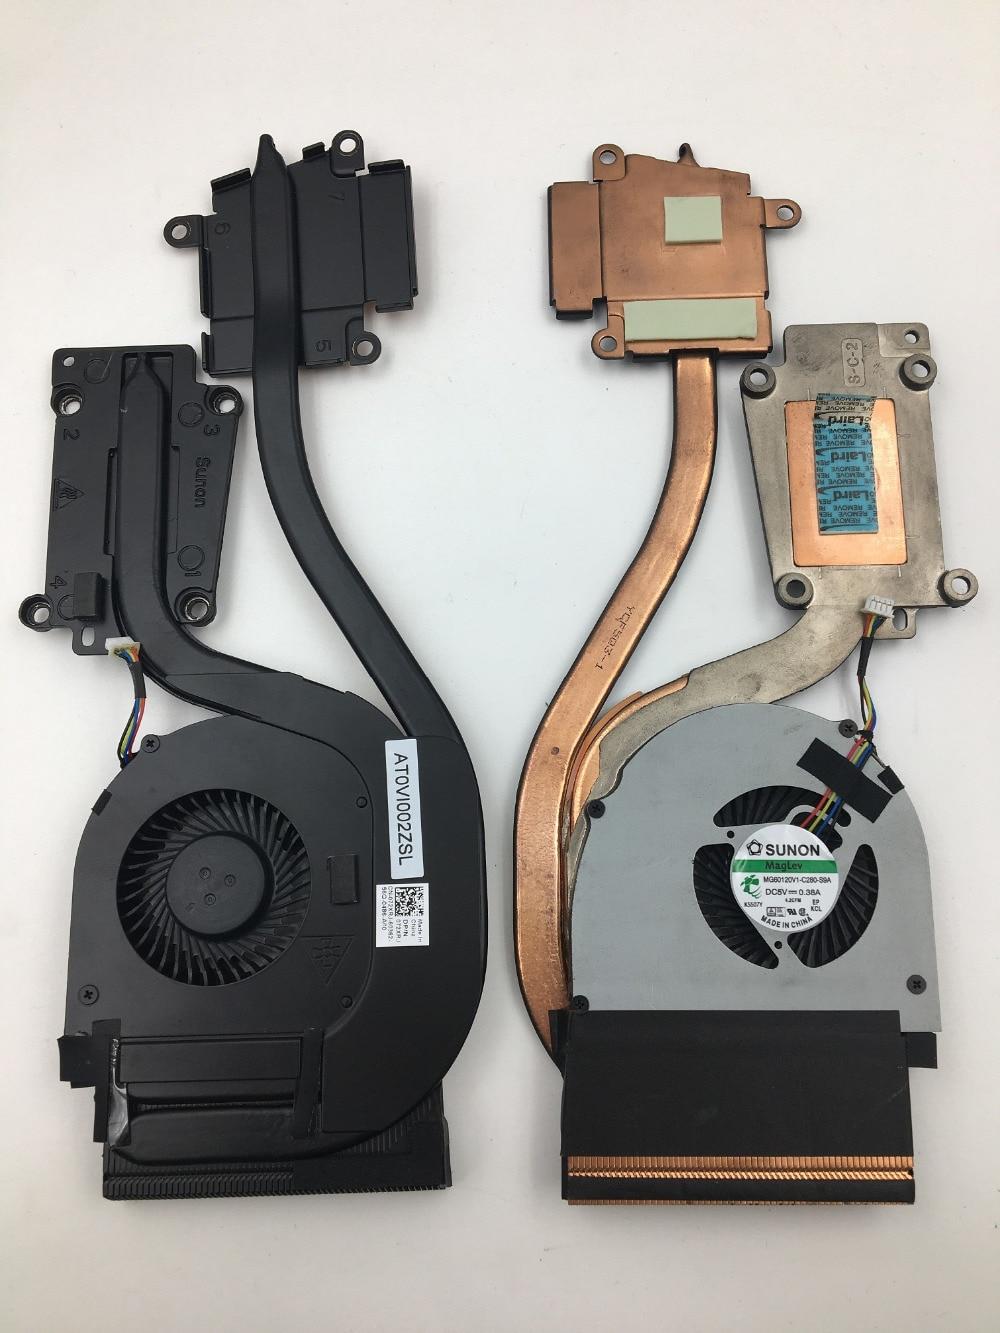 Оптовая продажа, новый вентилятор охлаждения процессора SSEA с радиатором для ноутбука Dell Latitude E6540, DP/N: 072XRJ 72XRJ